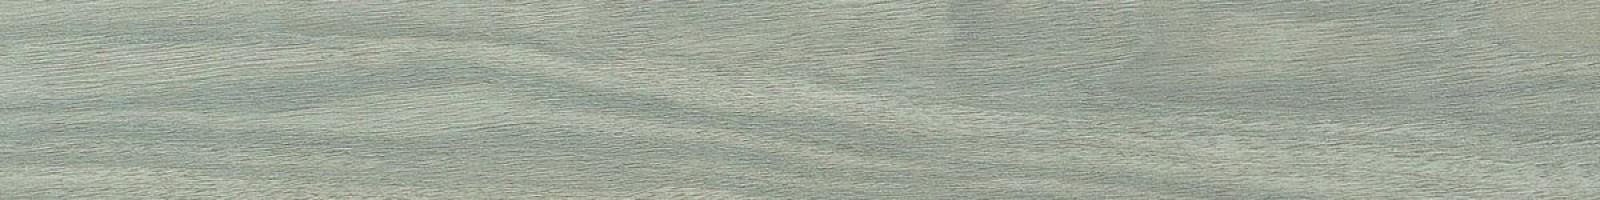 Керамогранит 741874 Wooden Gray Naturale 20x120 Casa Dolce Casa